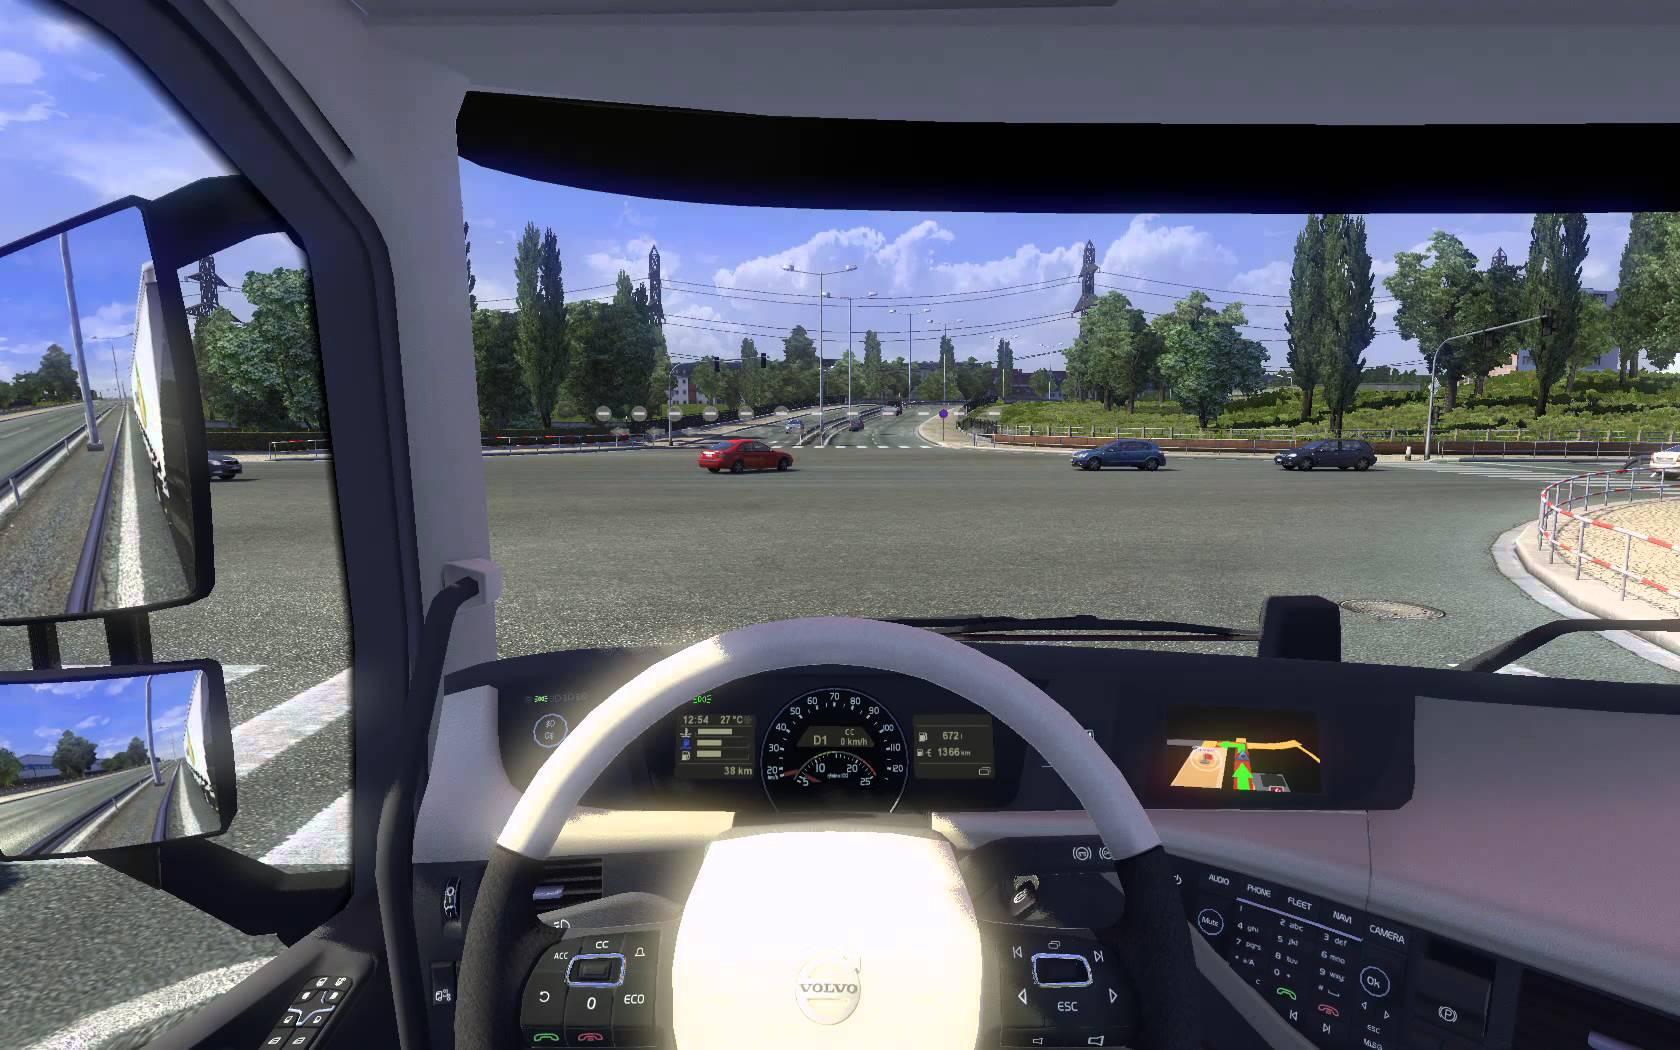 truck-physics-v2-1-by-night-son_1